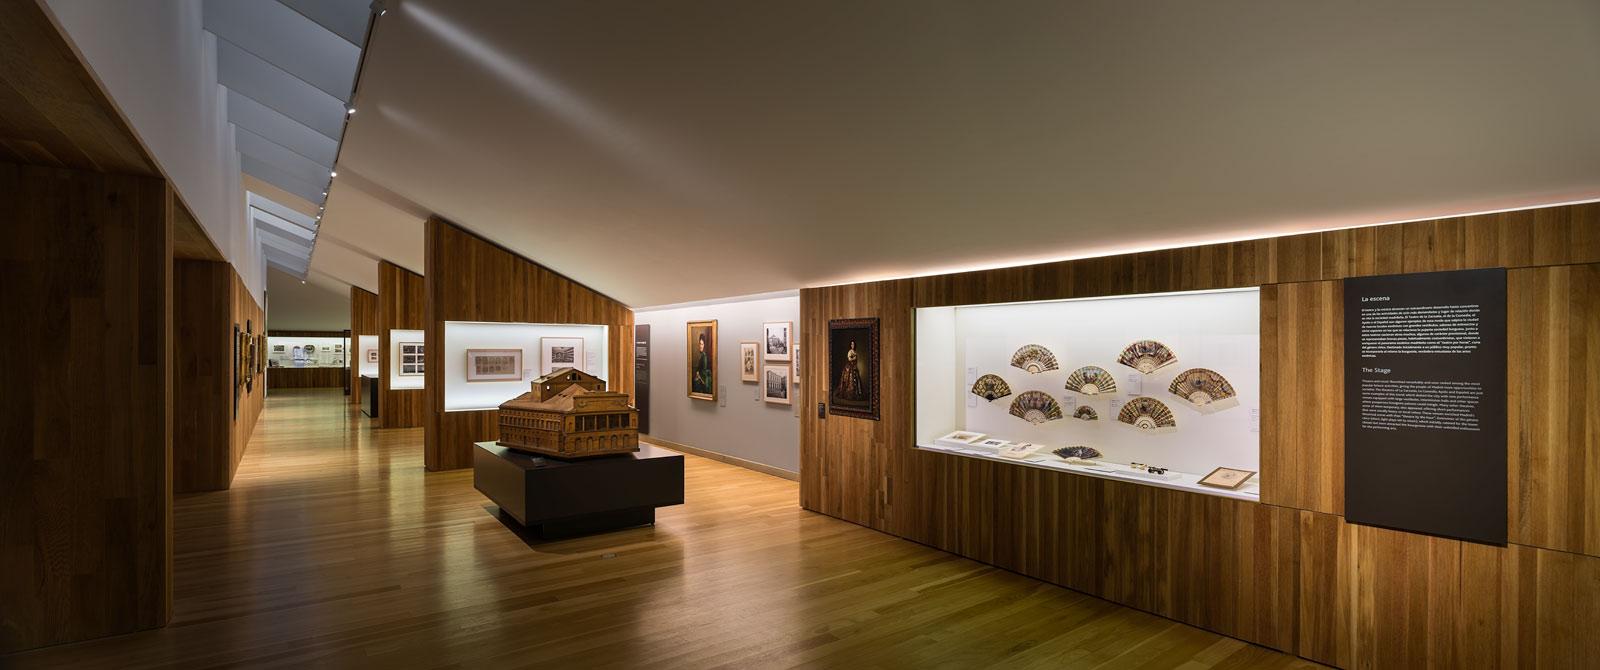 Museo de Historia de Madrid · Ypuntoending · 016.jpg